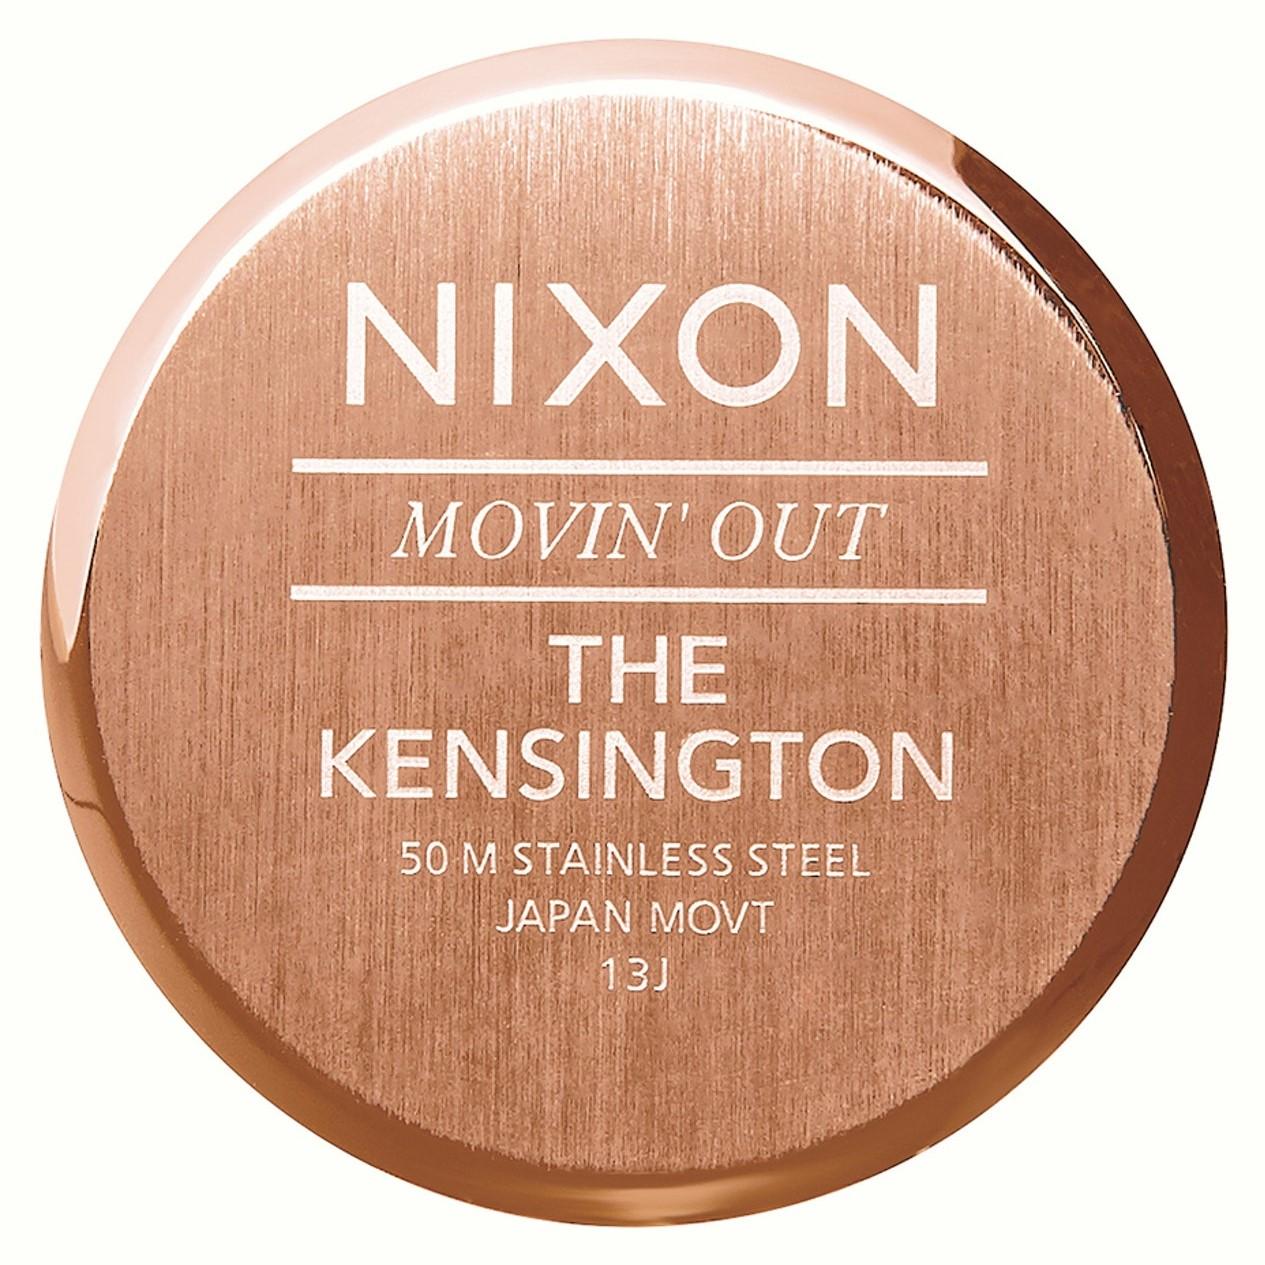 NIXON KENSINGTON.jpg